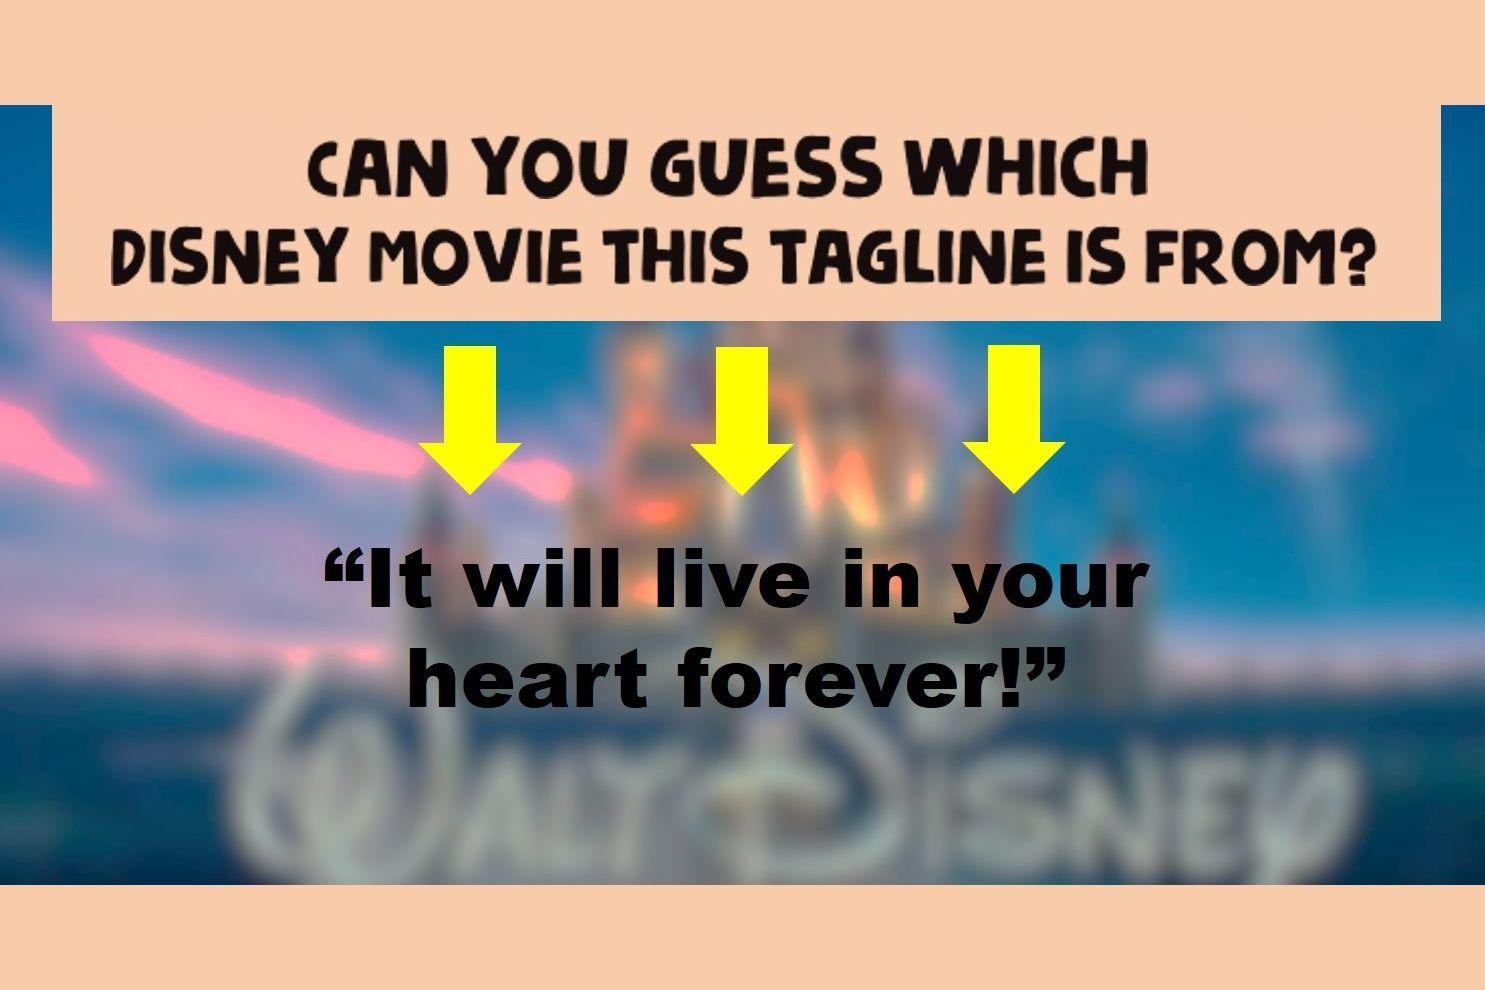 disney movie taglines